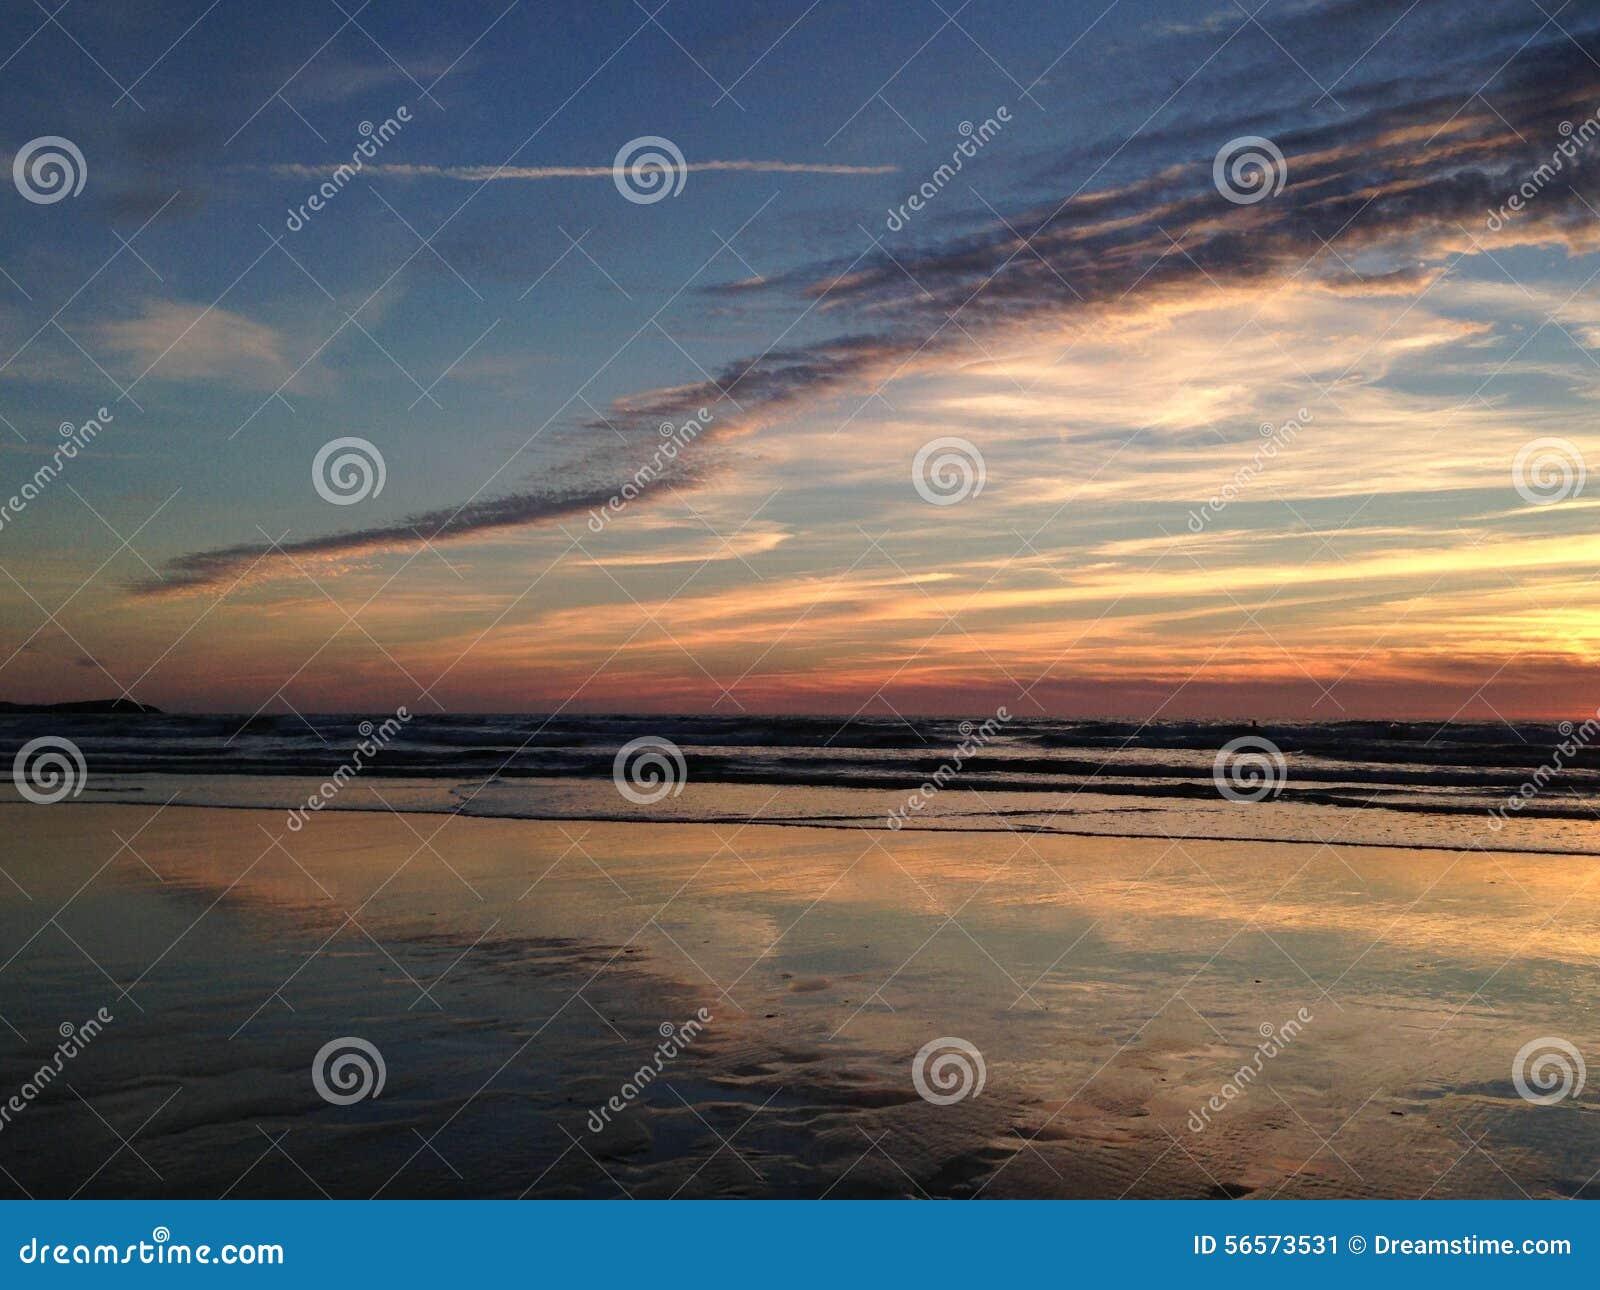 Download Ατλαντικός Ωκεανός πέρα από το ηλιοβασίλεμα Στοκ Εικόνα - εικόνα από ωκεανός, βράδυ: 56573531